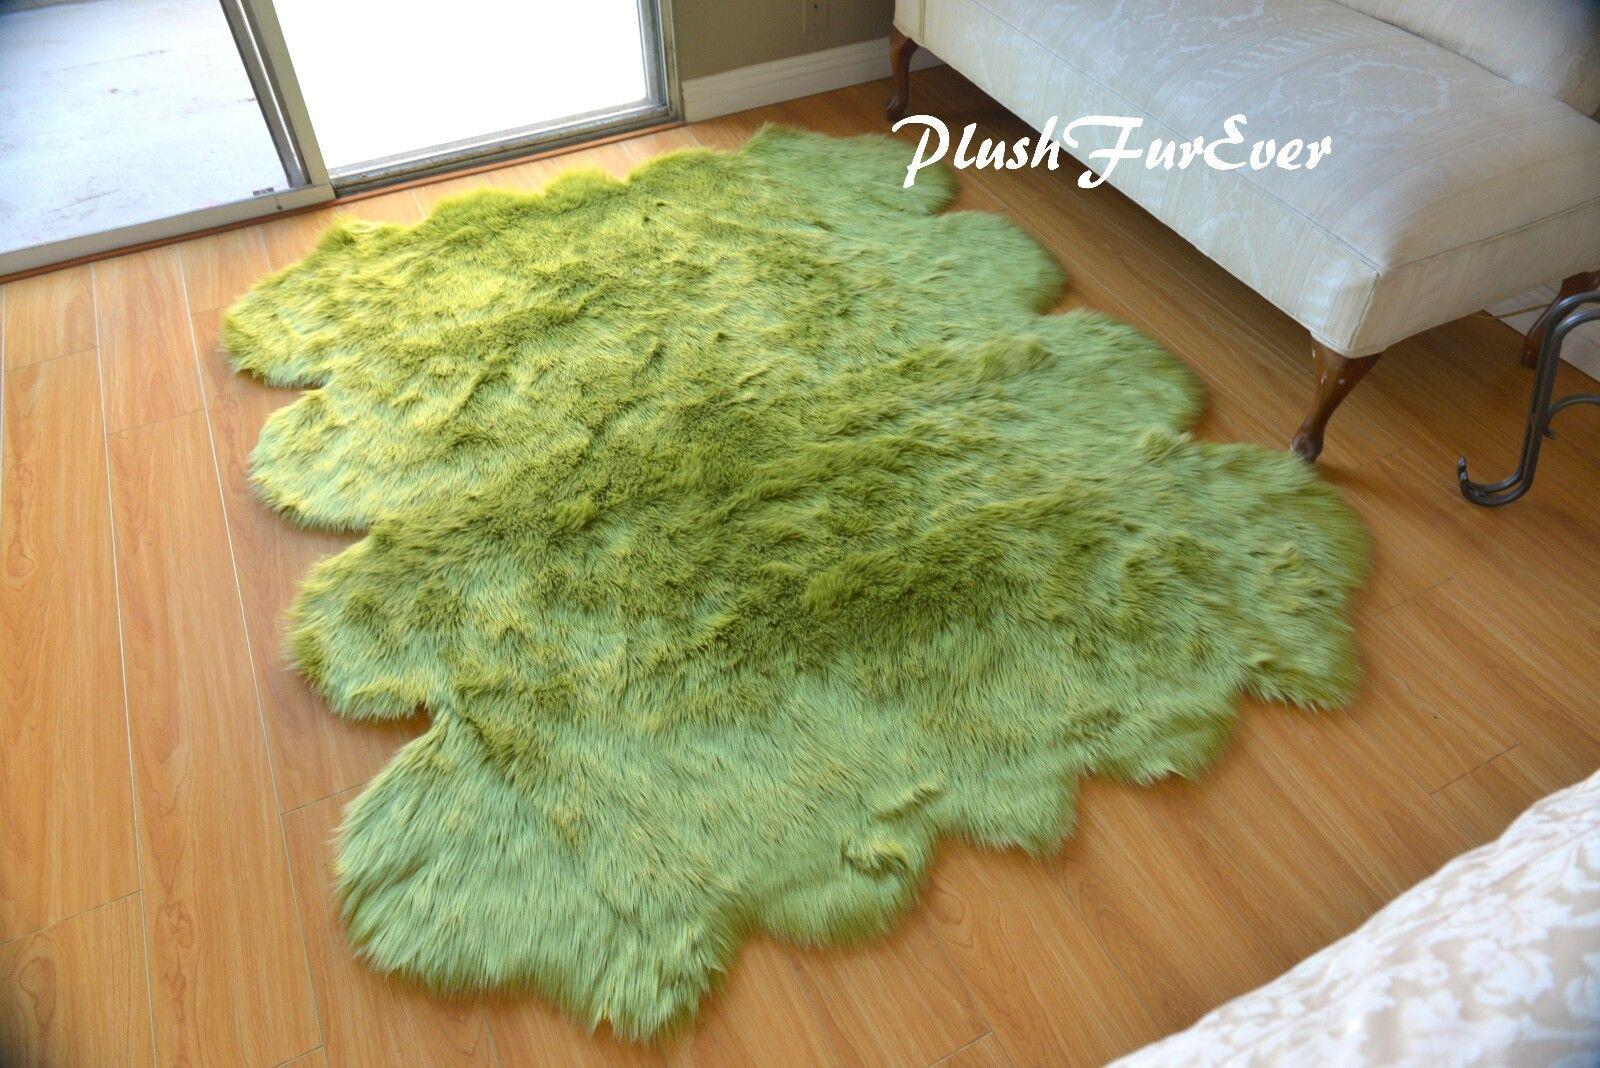 60  x 72  Olive Grün Sheepskin Area Rug Acrylics Polyester Imitate Accents Rugs